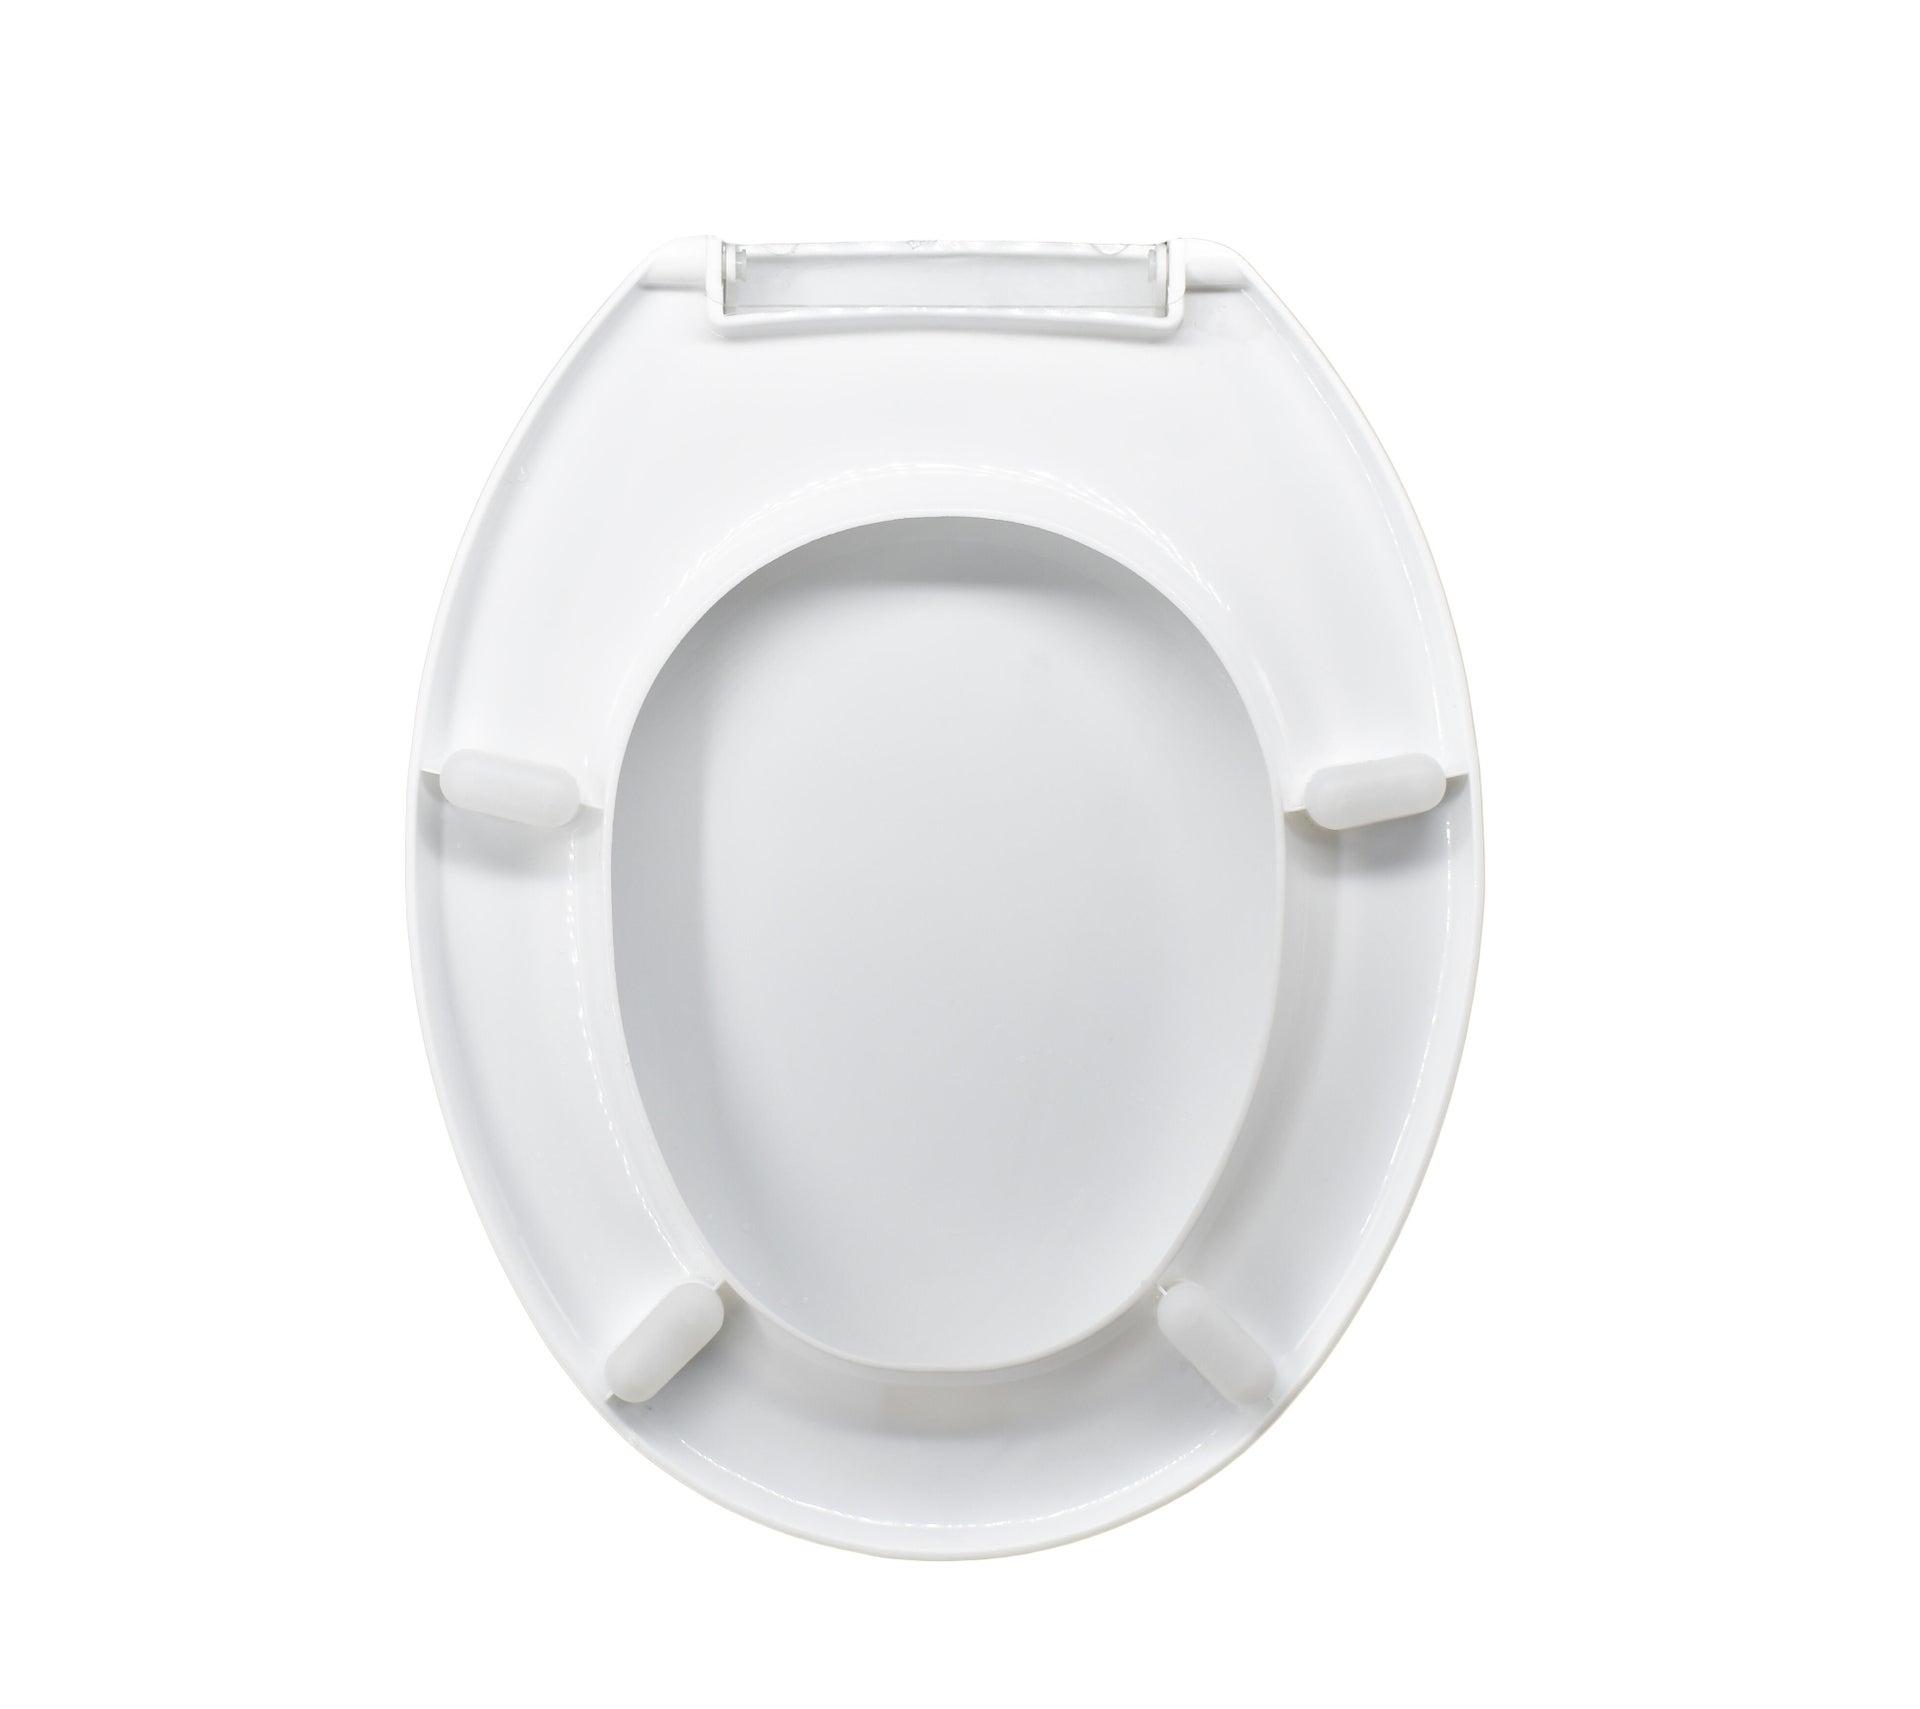 Copriwater ovale Universale Cefalo plastica bianco - 2